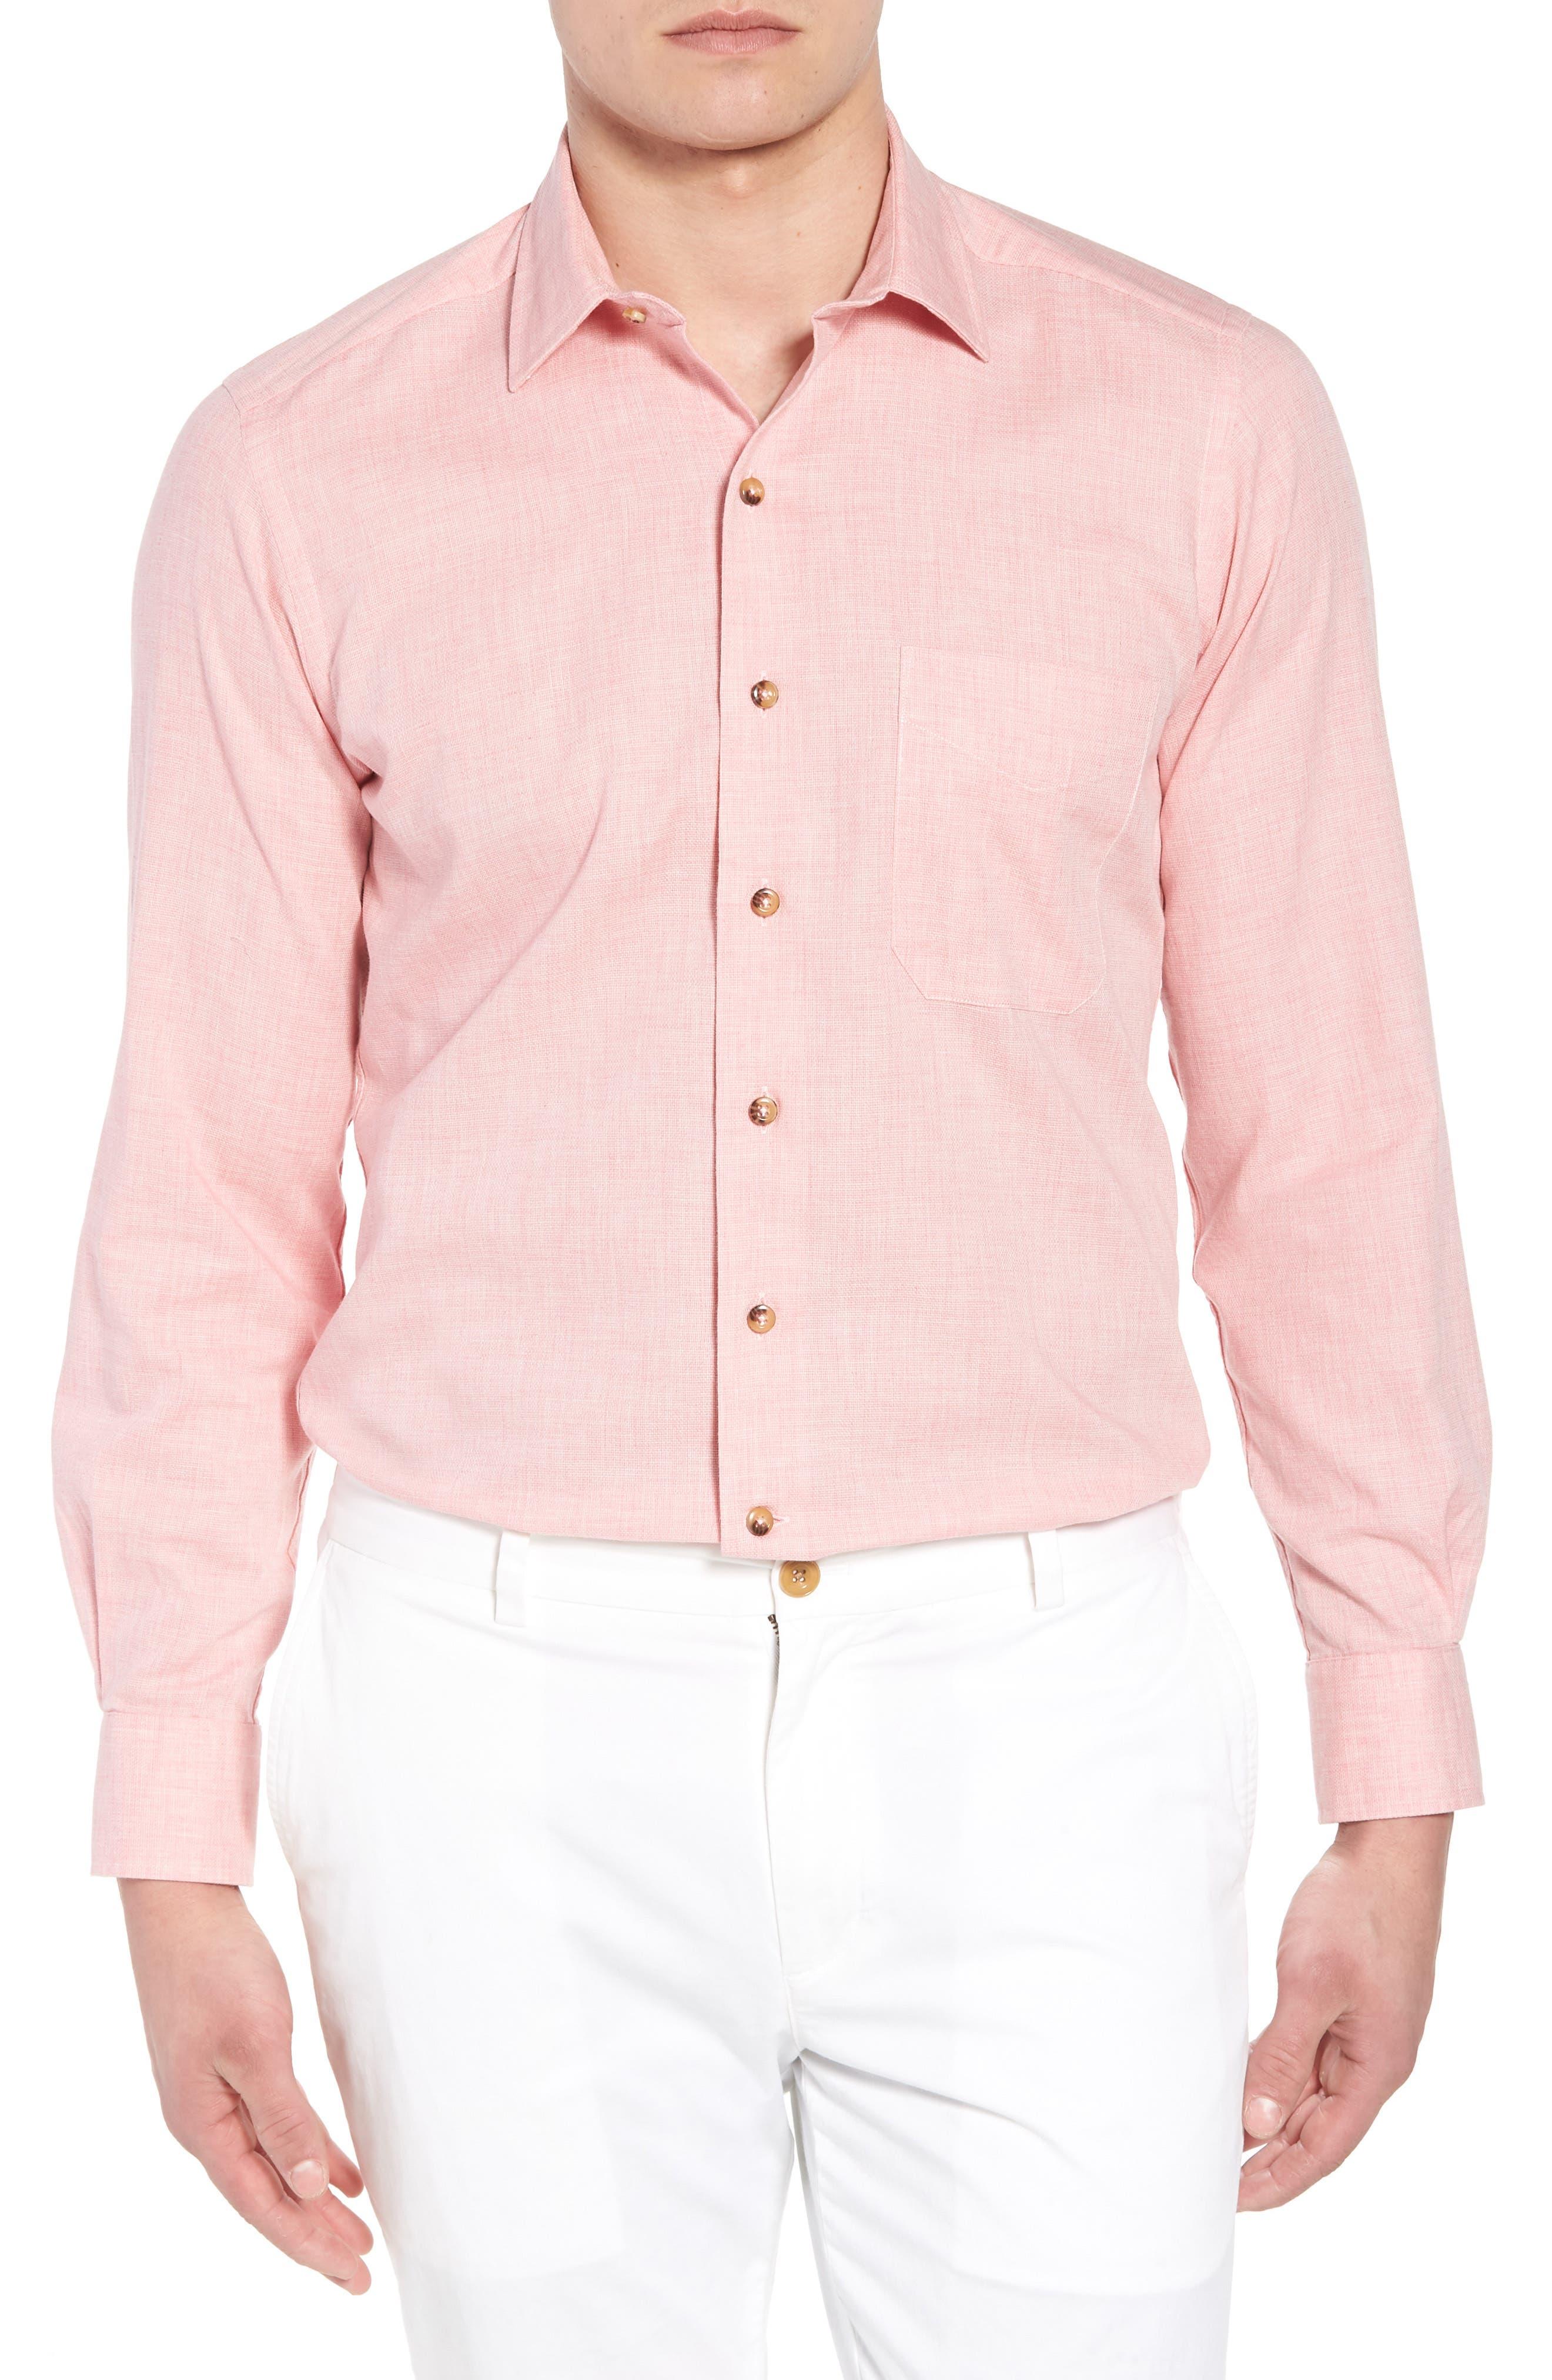 Regular Fit Garment Washed Mélange Sport Shirt,                             Main thumbnail 1, color,                             Pink